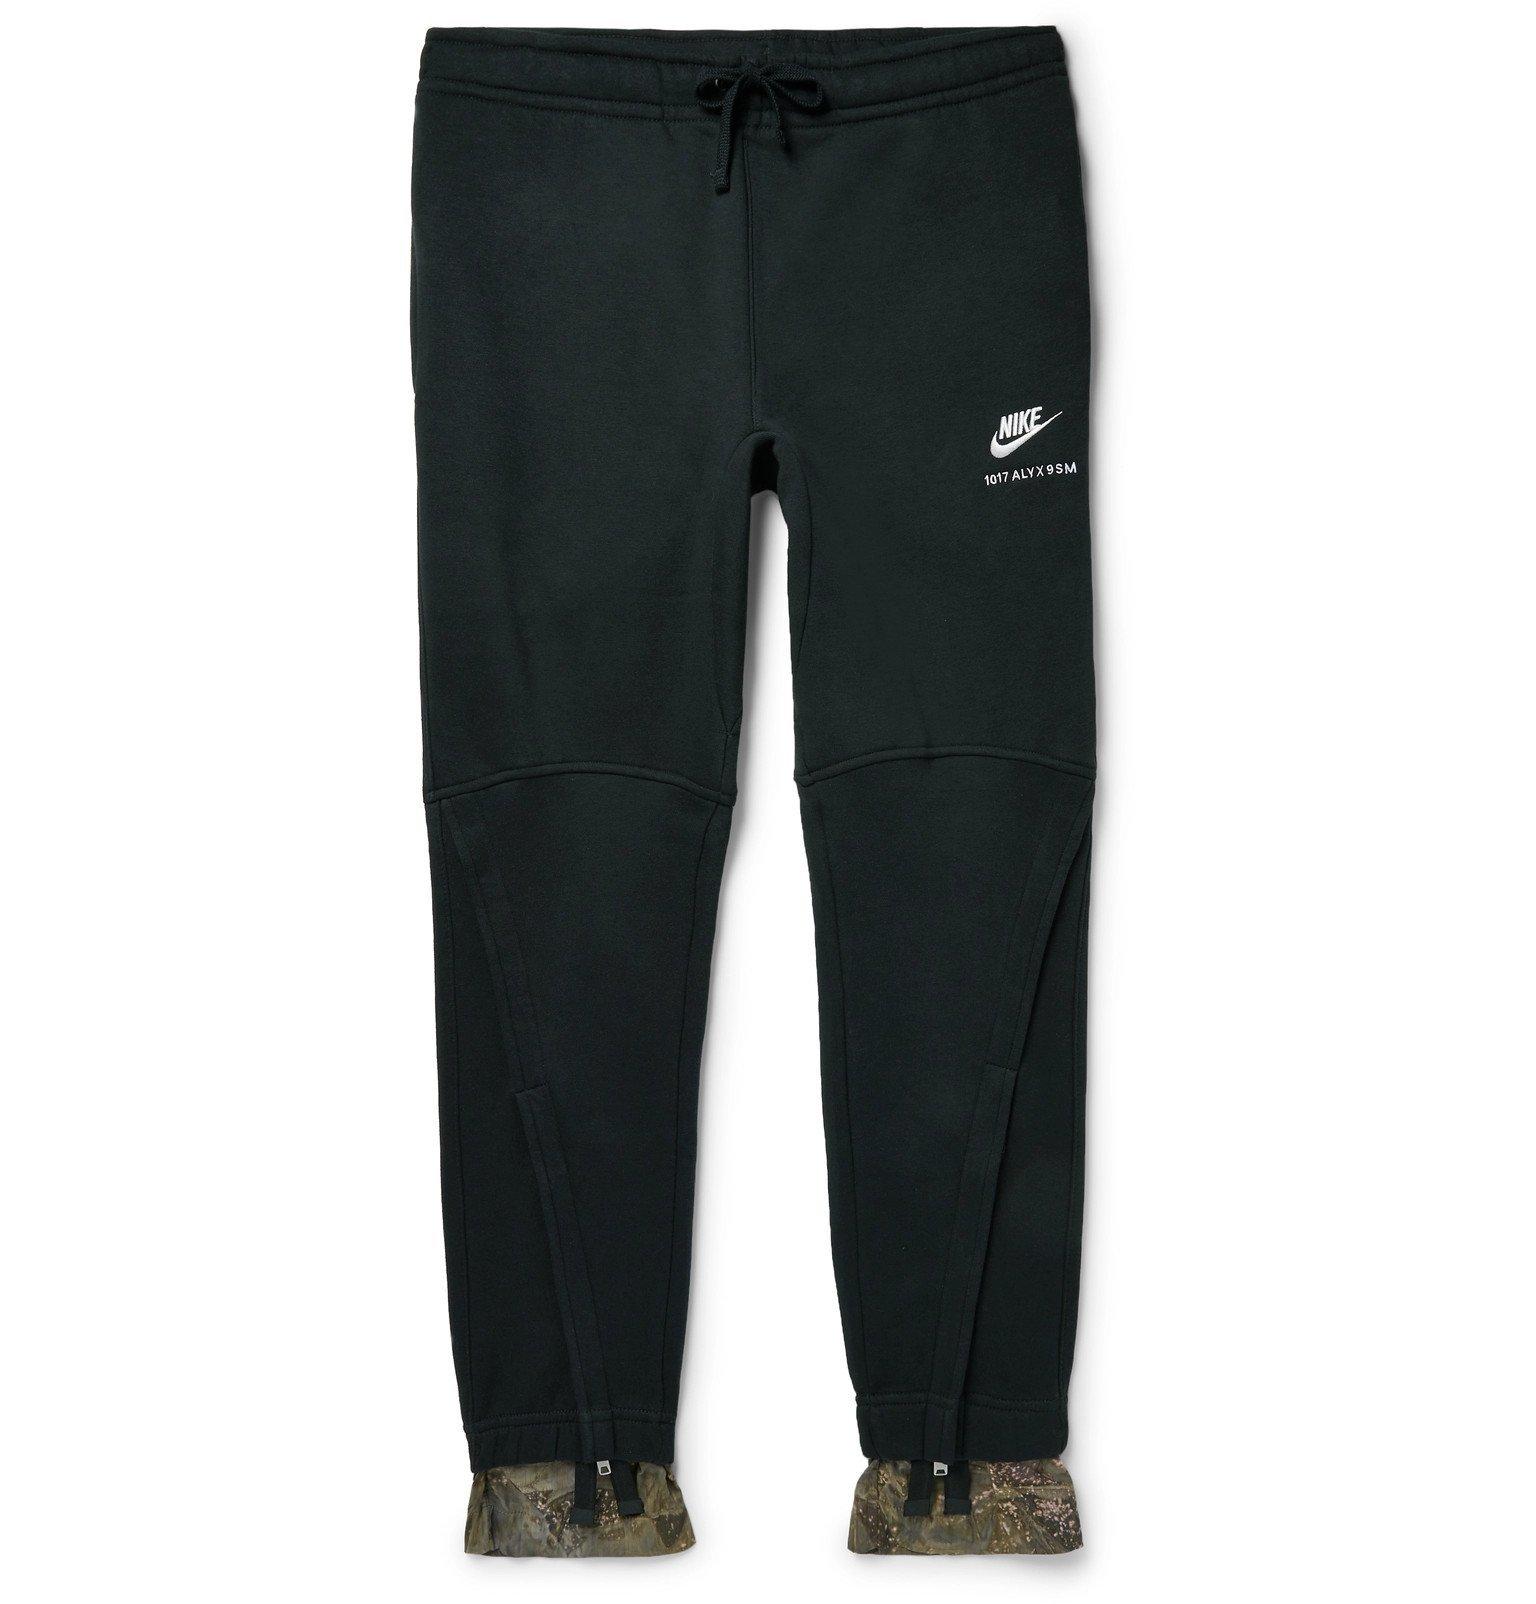 Photo: 1017 ALYX 9SM - Nike Tapered Camouflage-Print Trimmed Fleece-Back Cotton-Blend Jersey Sweatpants - Black